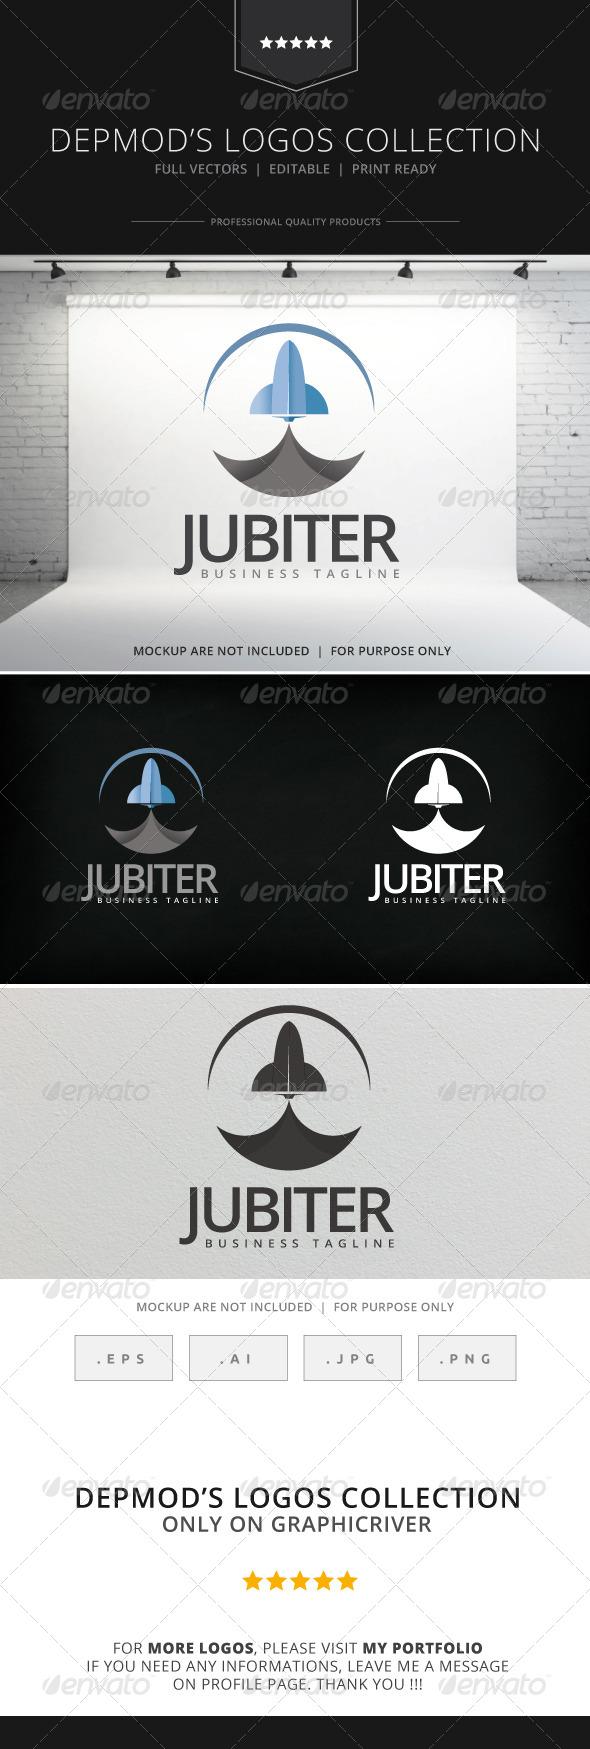 GraphicRiver Jubiter Logo 8047286